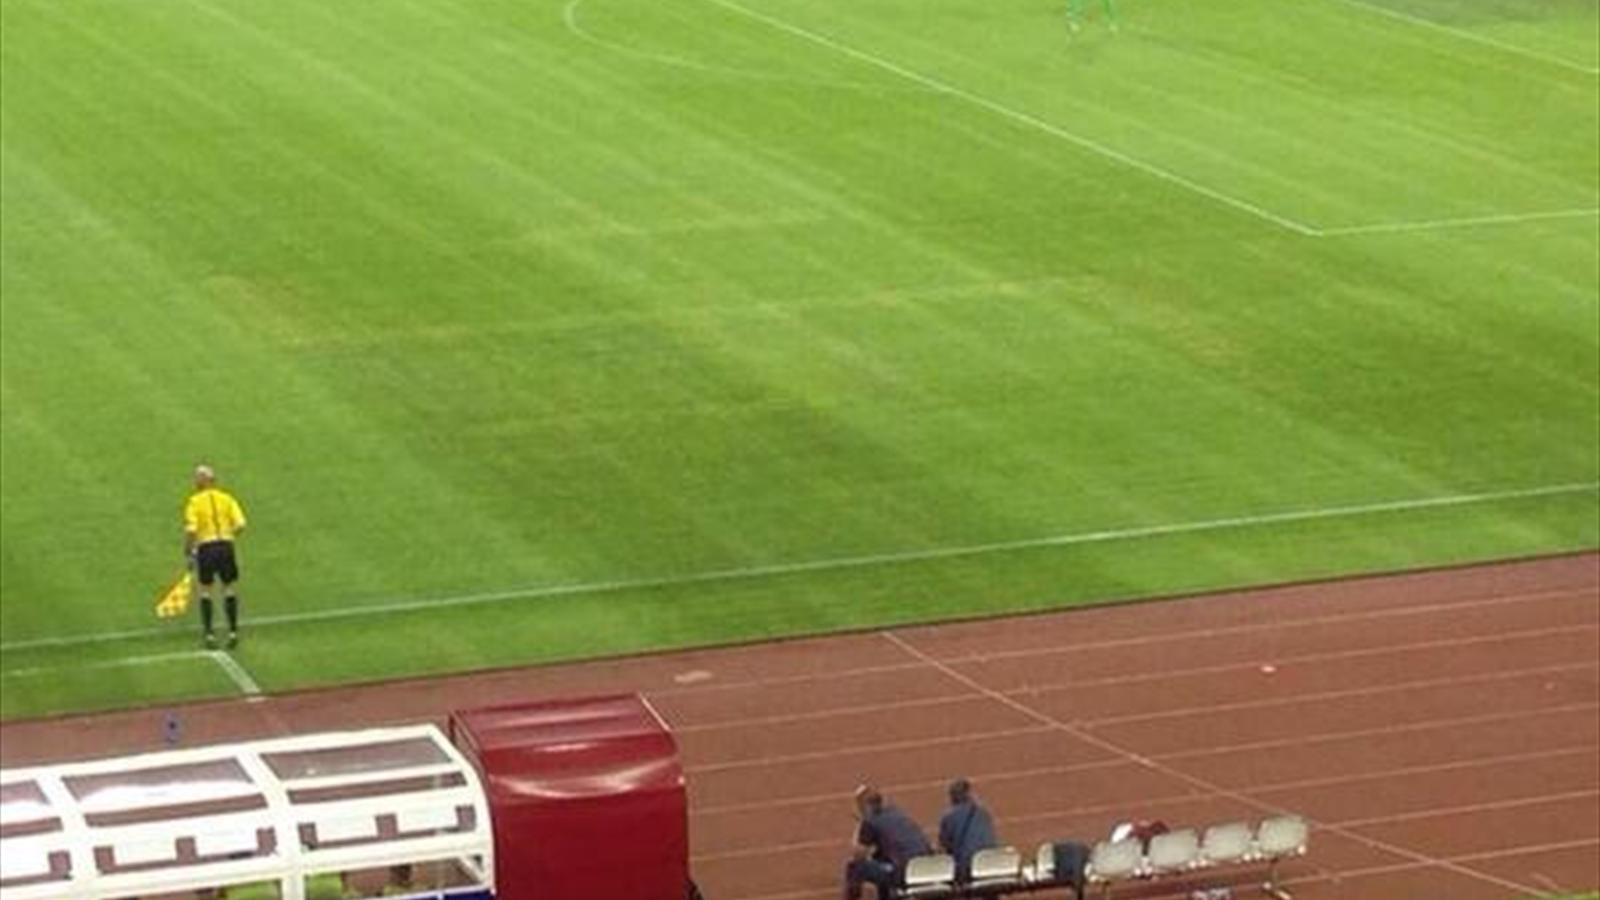 Italy complain after Swastika is found on turf in Croatia - Euro 2016 - Football - Eurosport